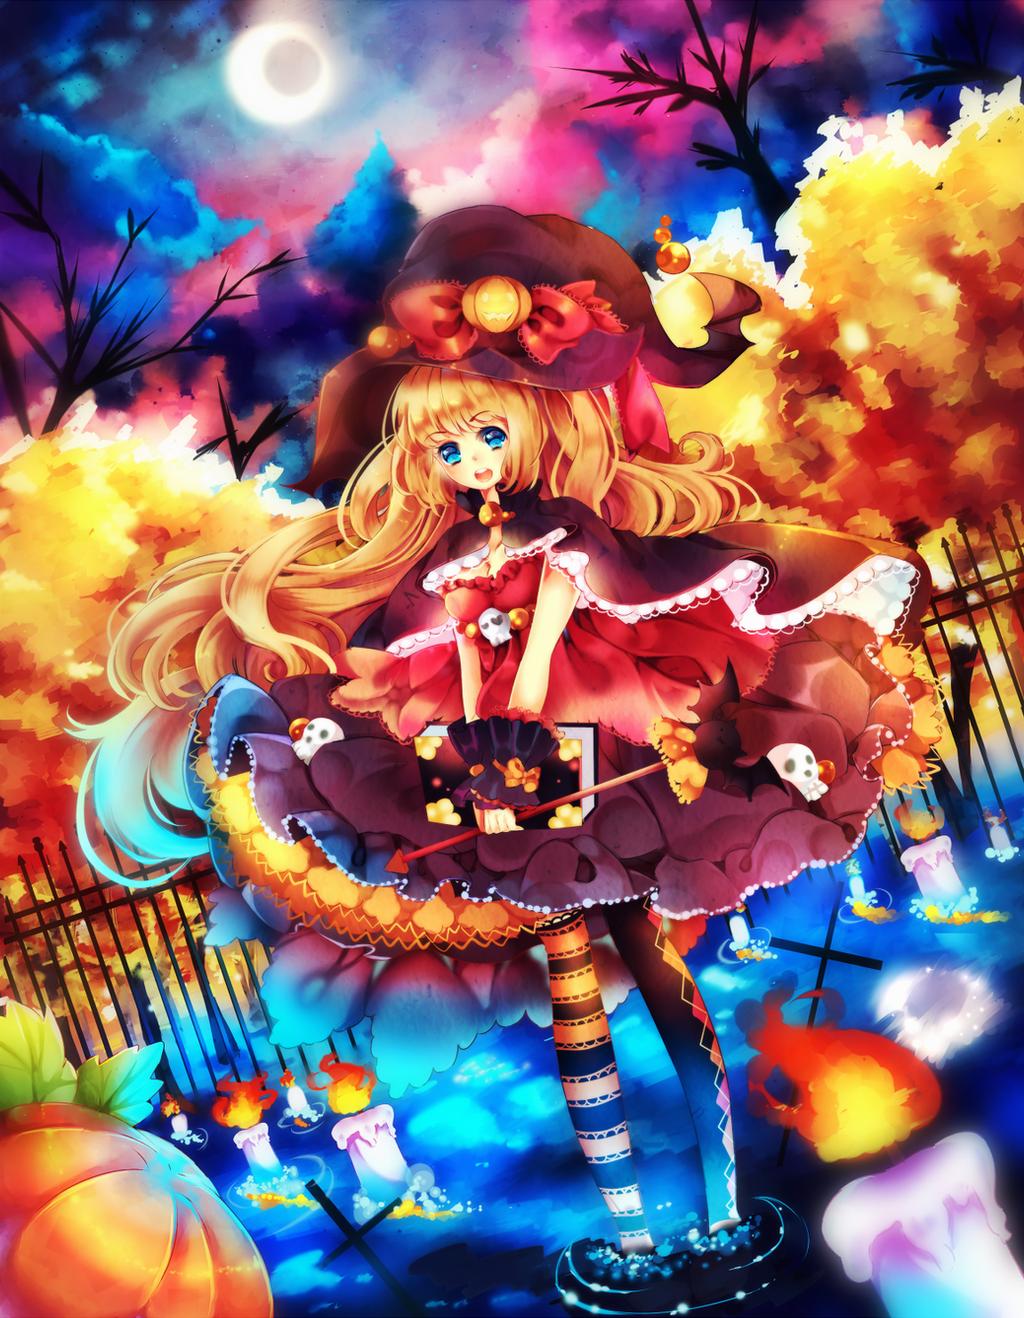 Halloween 2013 by Maruuki